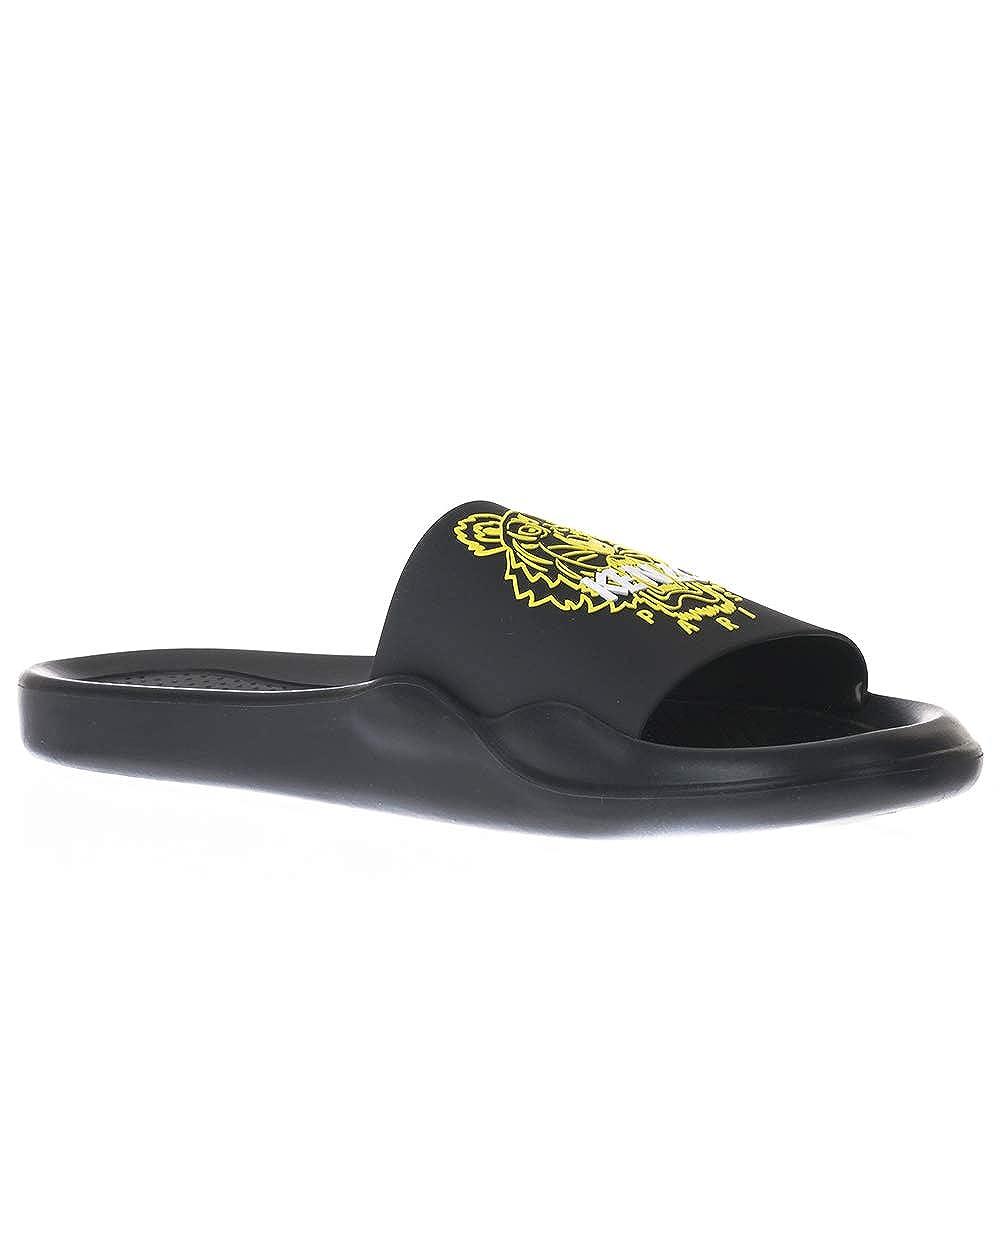 a03779ae4 Amazon.com | Kenzo Tiger Head Rubber Pool Slide Sandals Black | Slippers